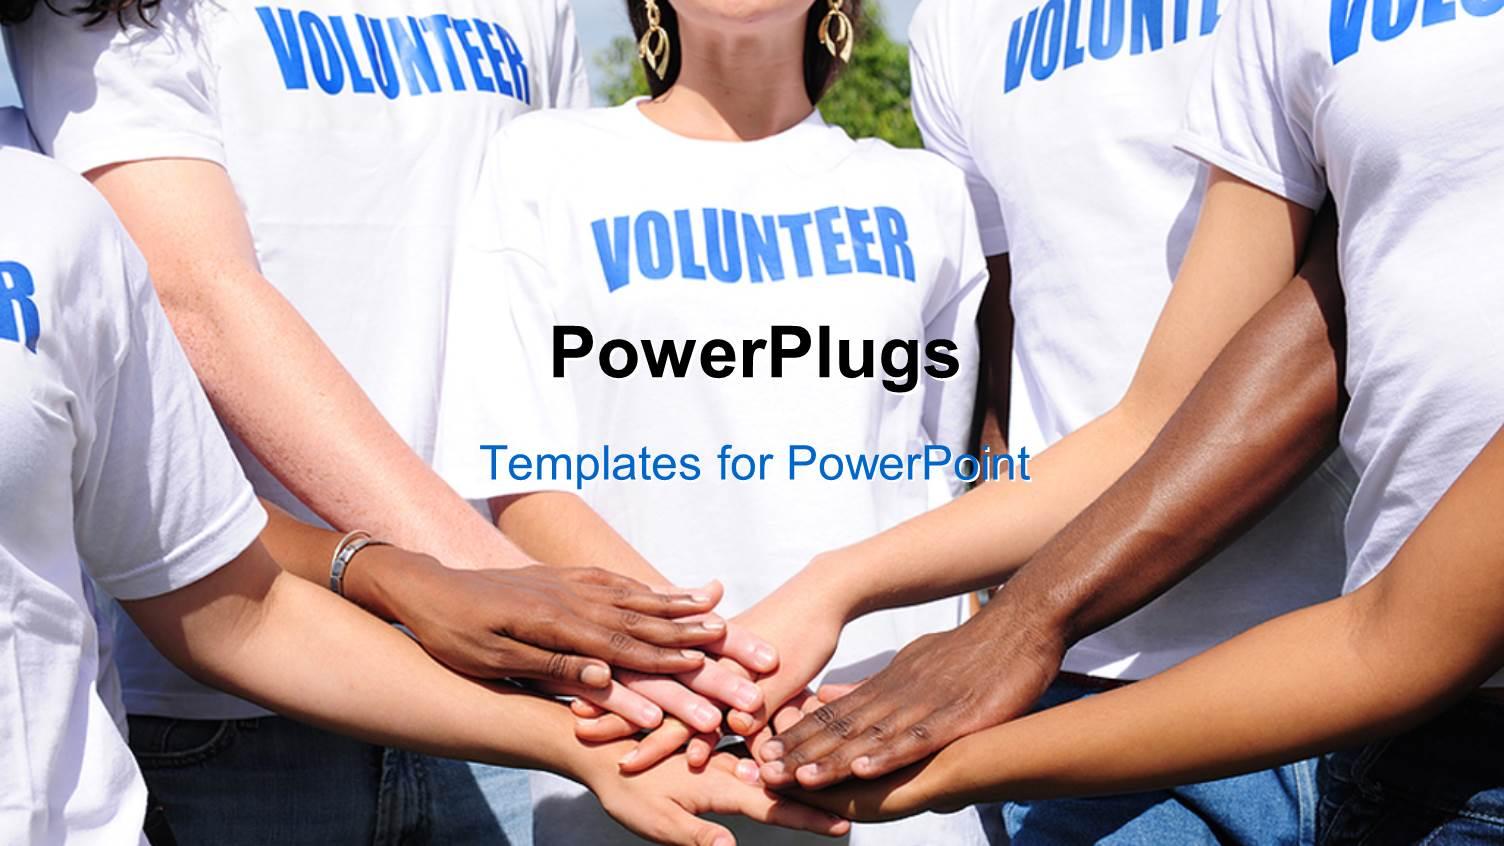 Powerpoint template group of friends together with keywords 11715 powerplugs powerpoint template with volunteer group in uniform put hands together in unity toneelgroepblik Gallery